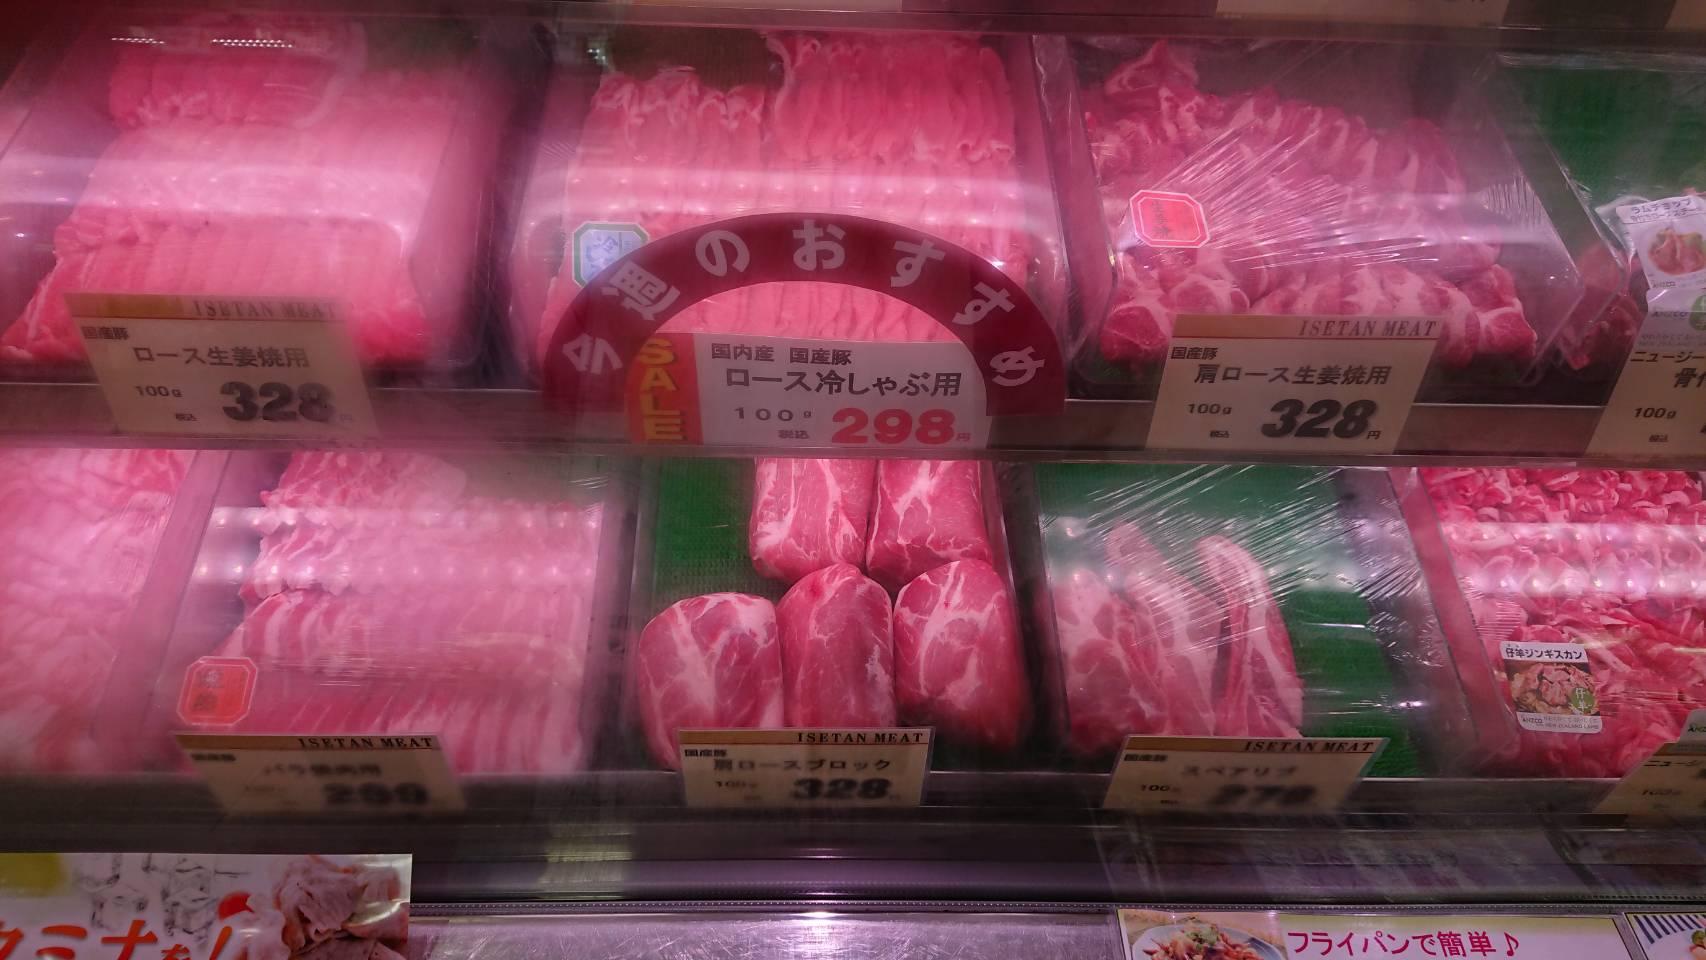 ISETAN MEAT(京都市/肉)